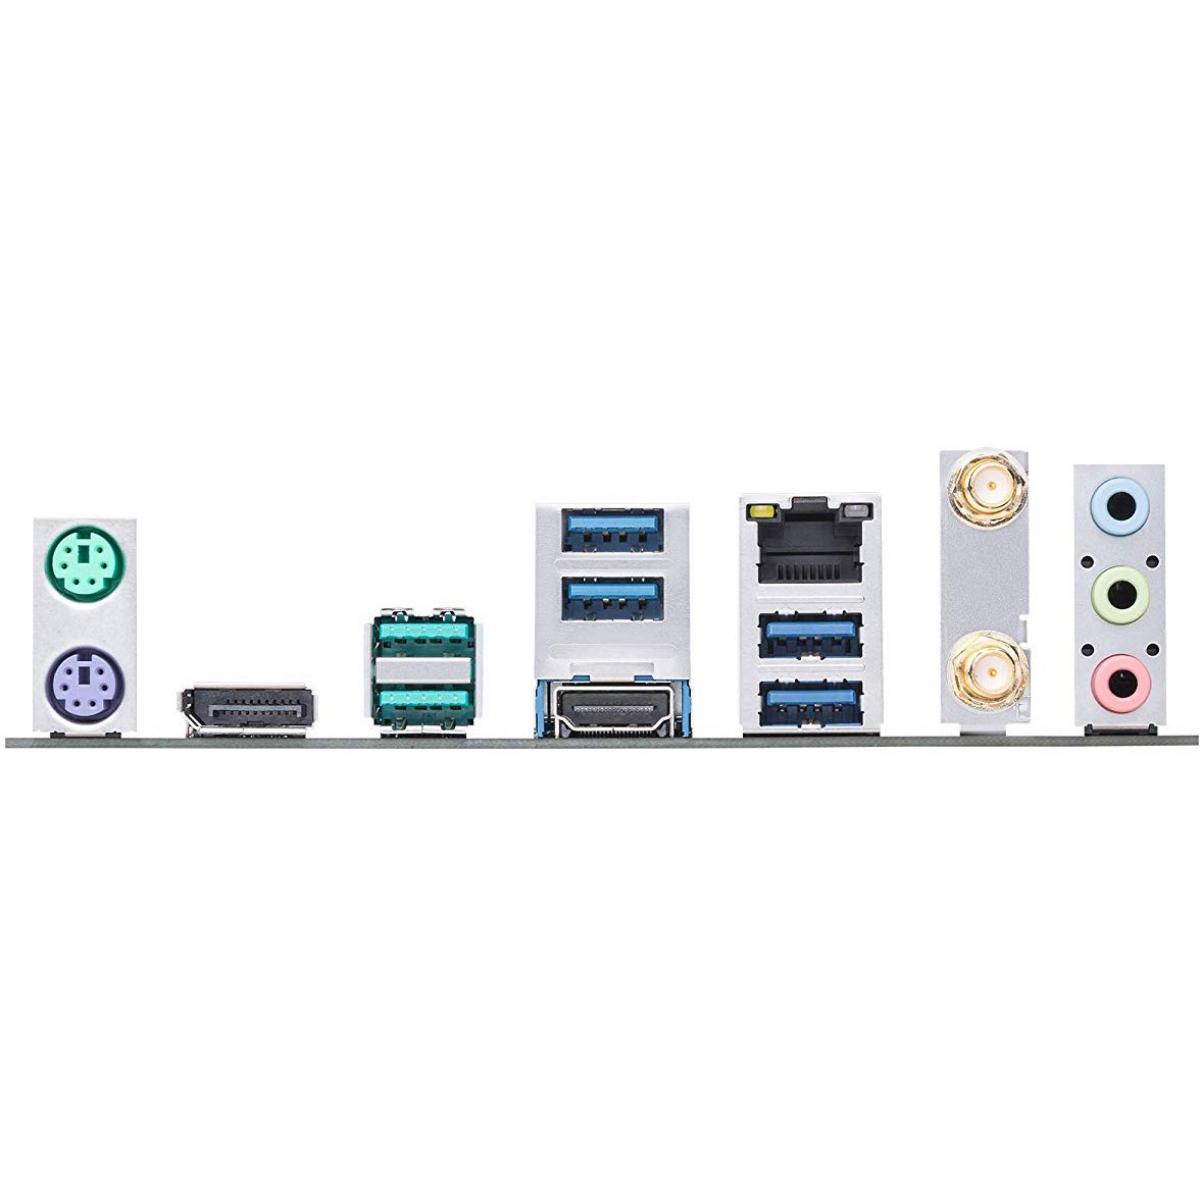 Placa Mãe Asus TUF Z390-Plus Gaming (Wi-fi), Chipset Z390, Intel LGA 1151, ATX, DDR4